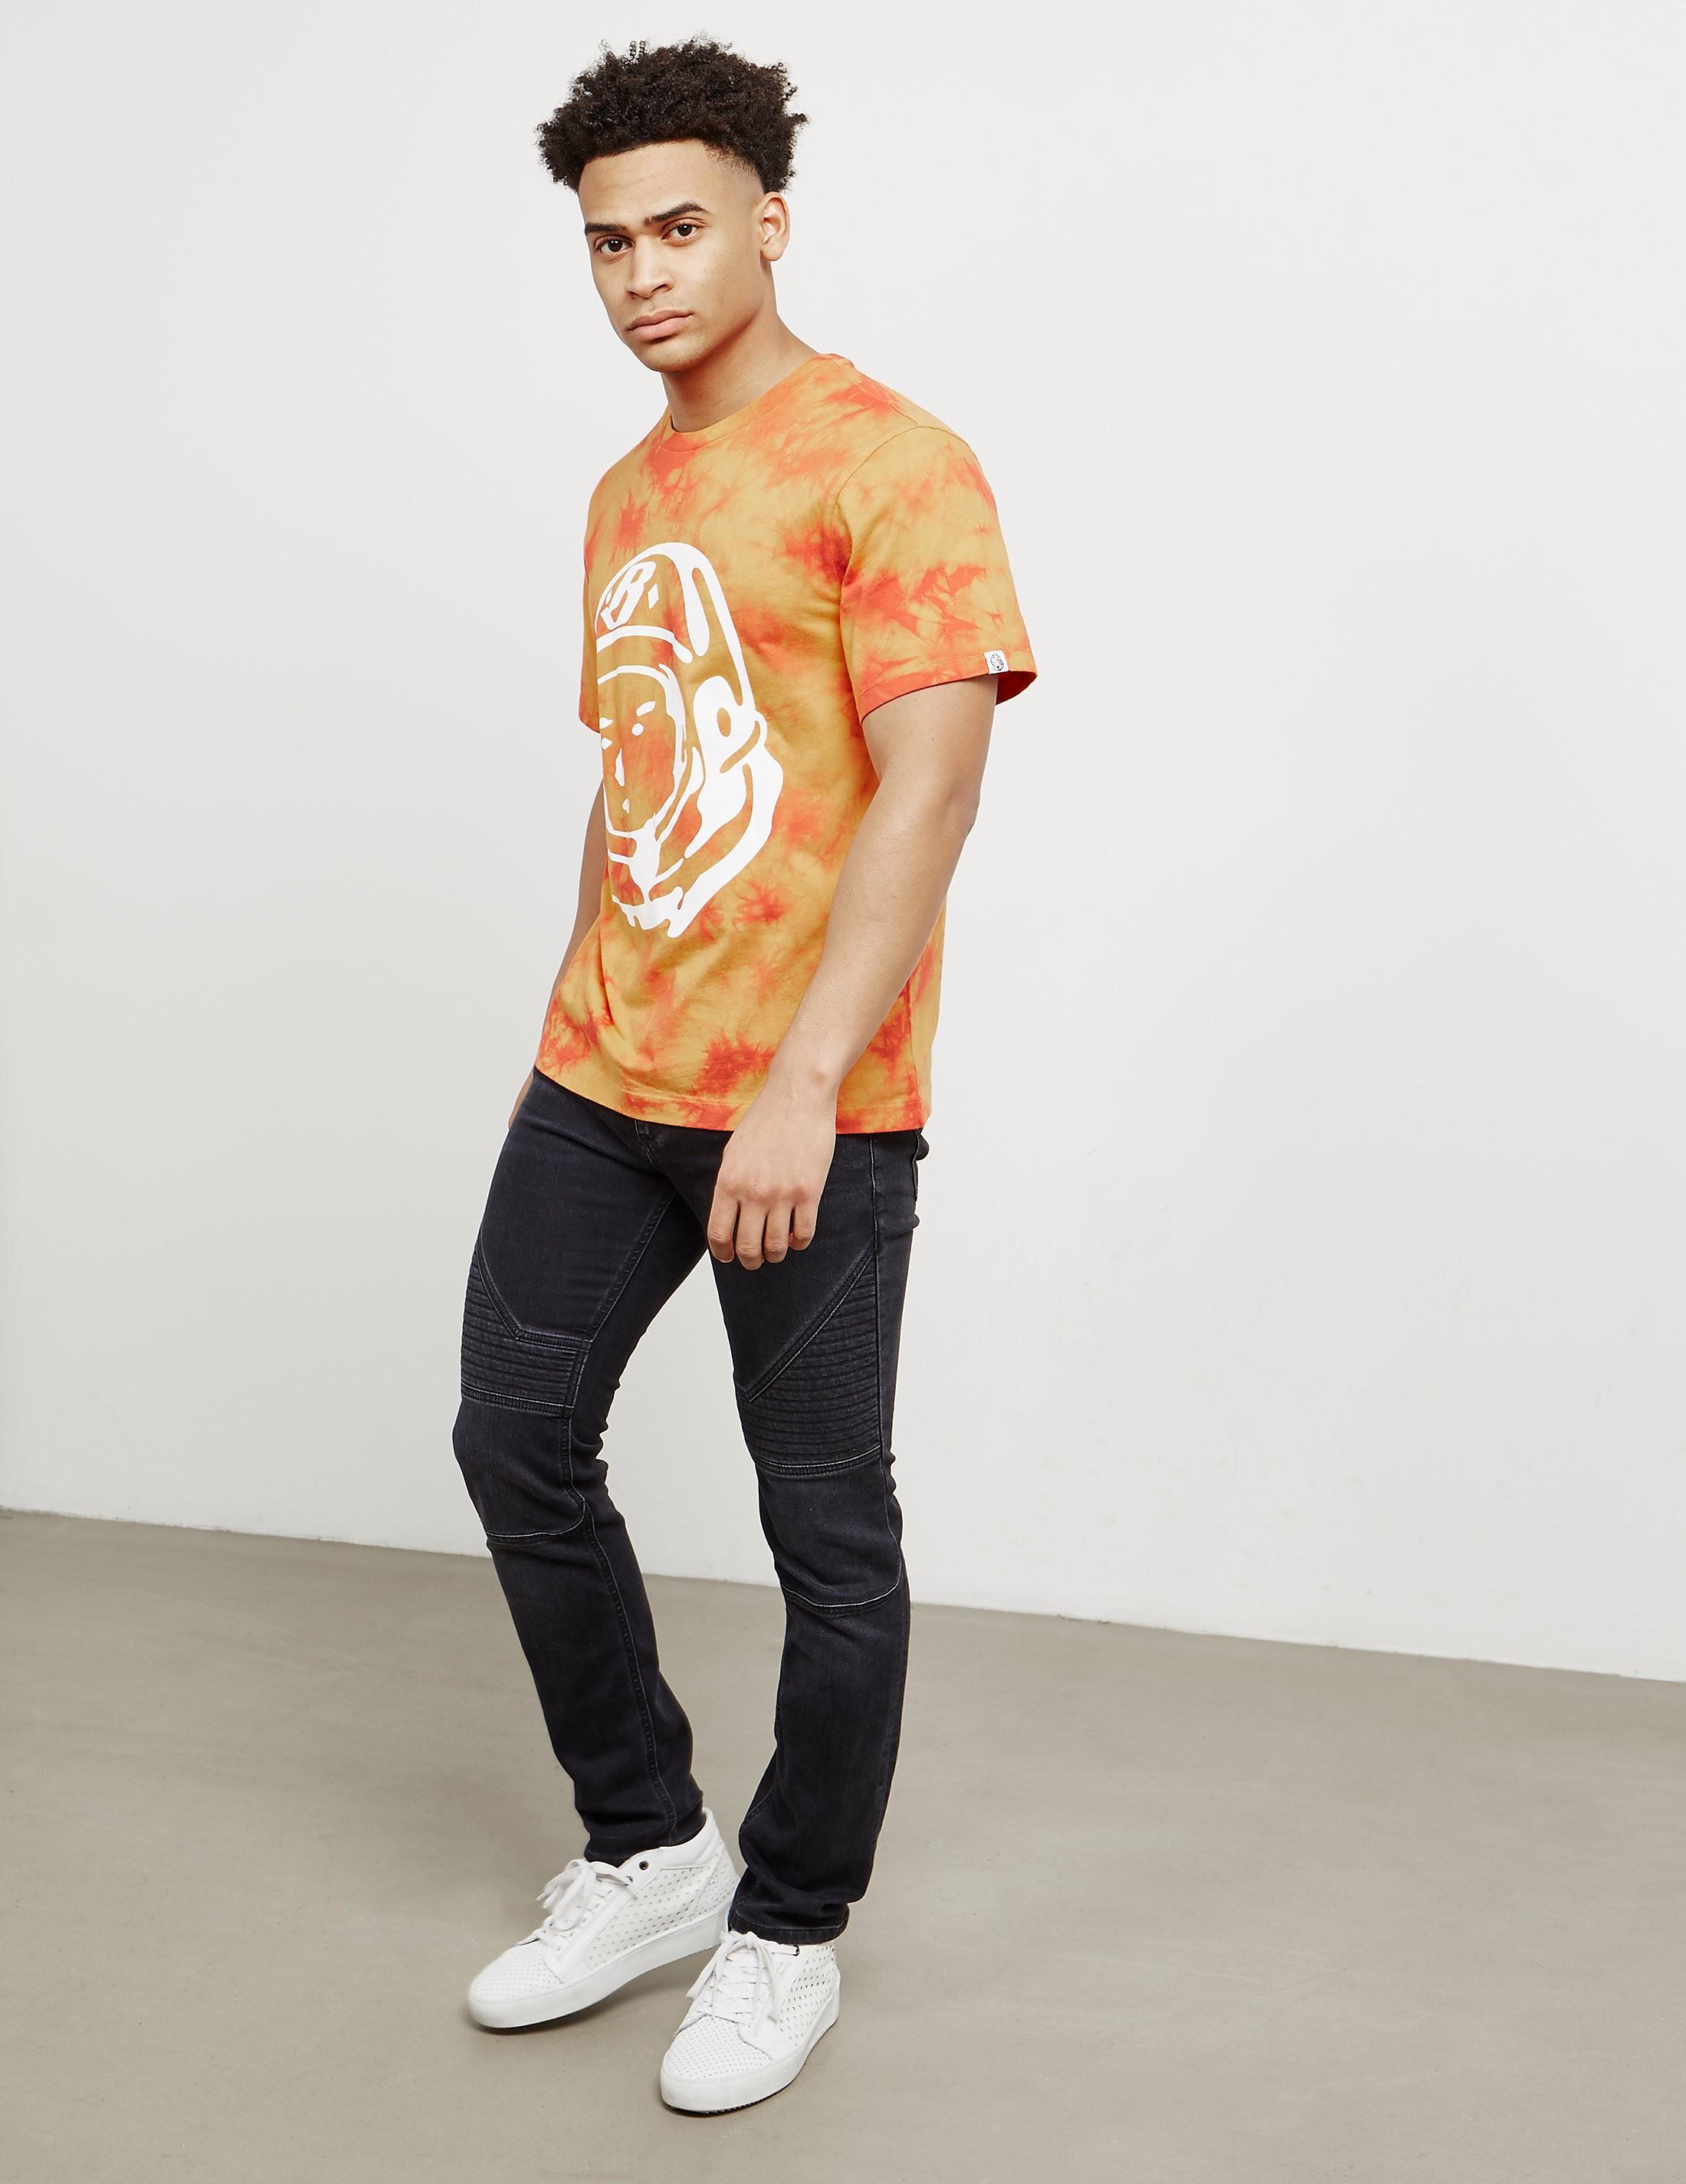 Billionaire Boys Club Tie Dye Short Sleeve T-Shirt - Online Exclusive